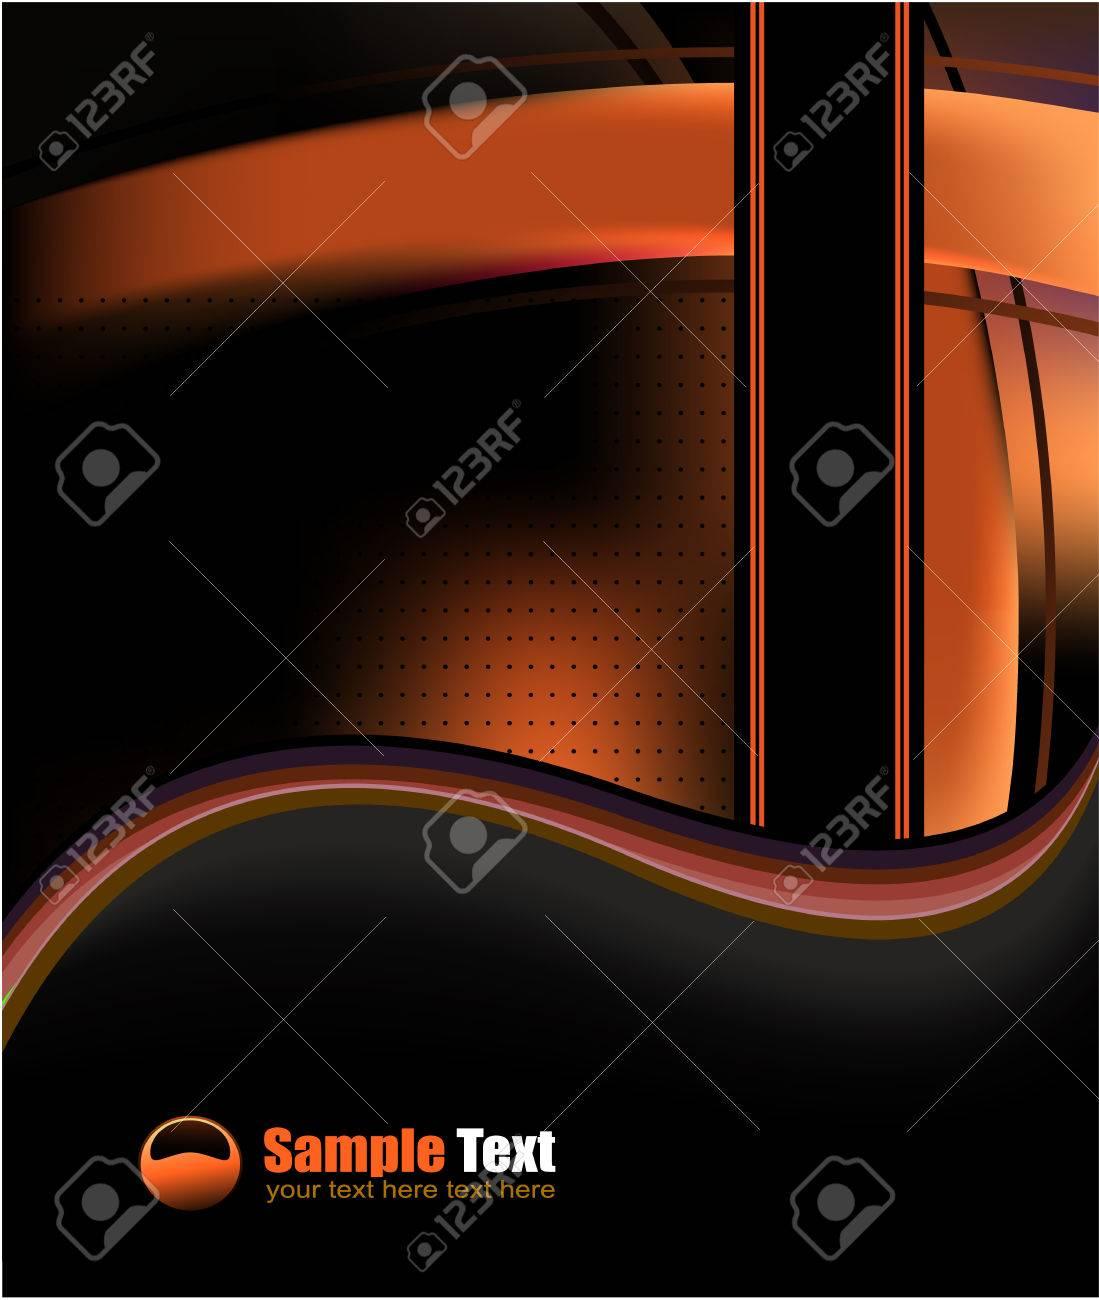 Elegant style futuristic business card for depliant or brochures elegant style futuristic business card for depliant or brochures cover stock vector 5855187 colourmoves